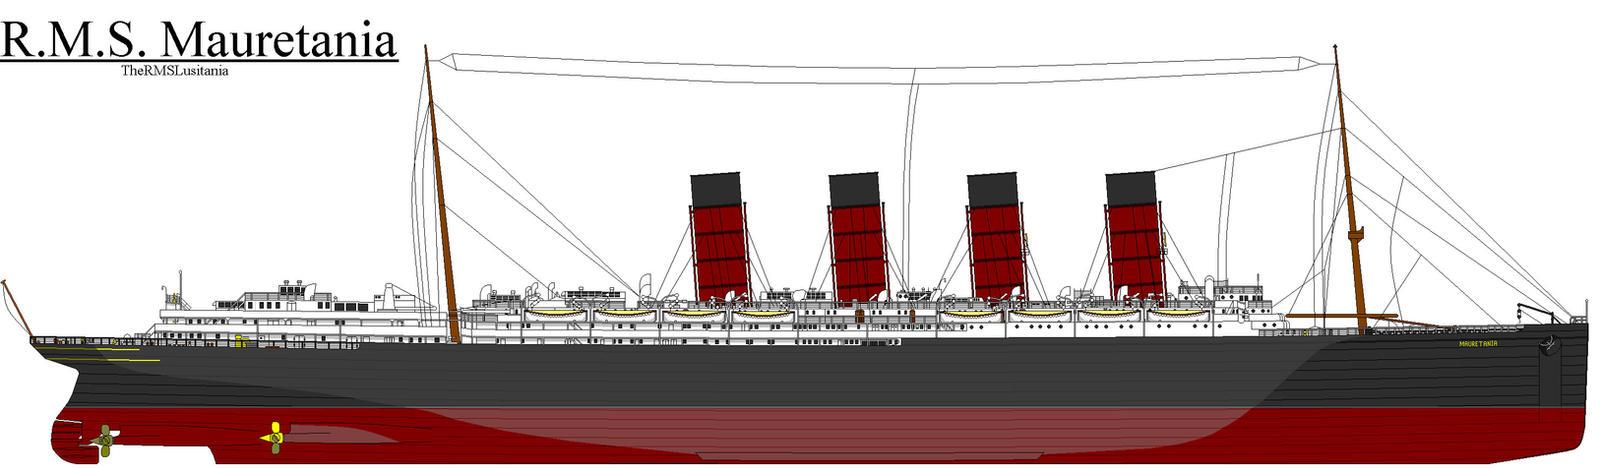 RMS Mauretania by ColinTheP6M on DeviantArt